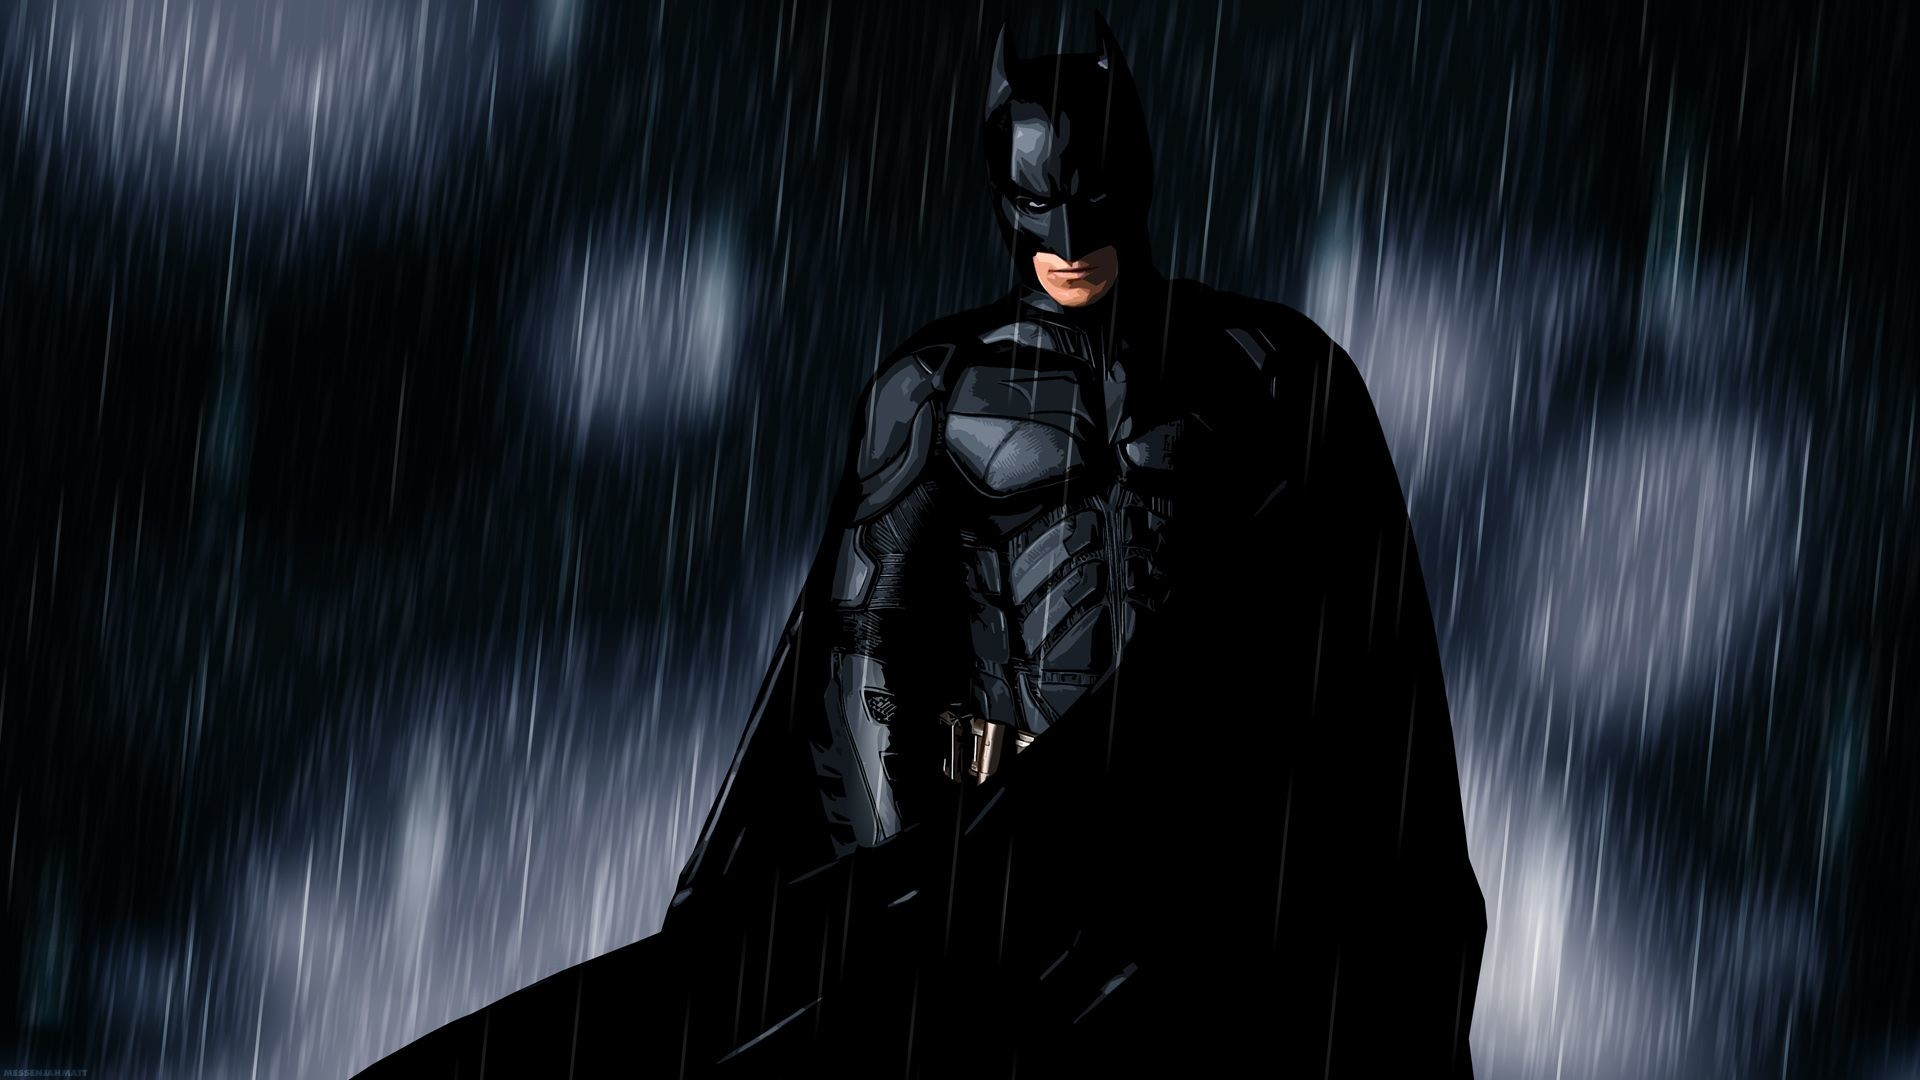 Batman Wallpapers And Screensavers (73+ Images